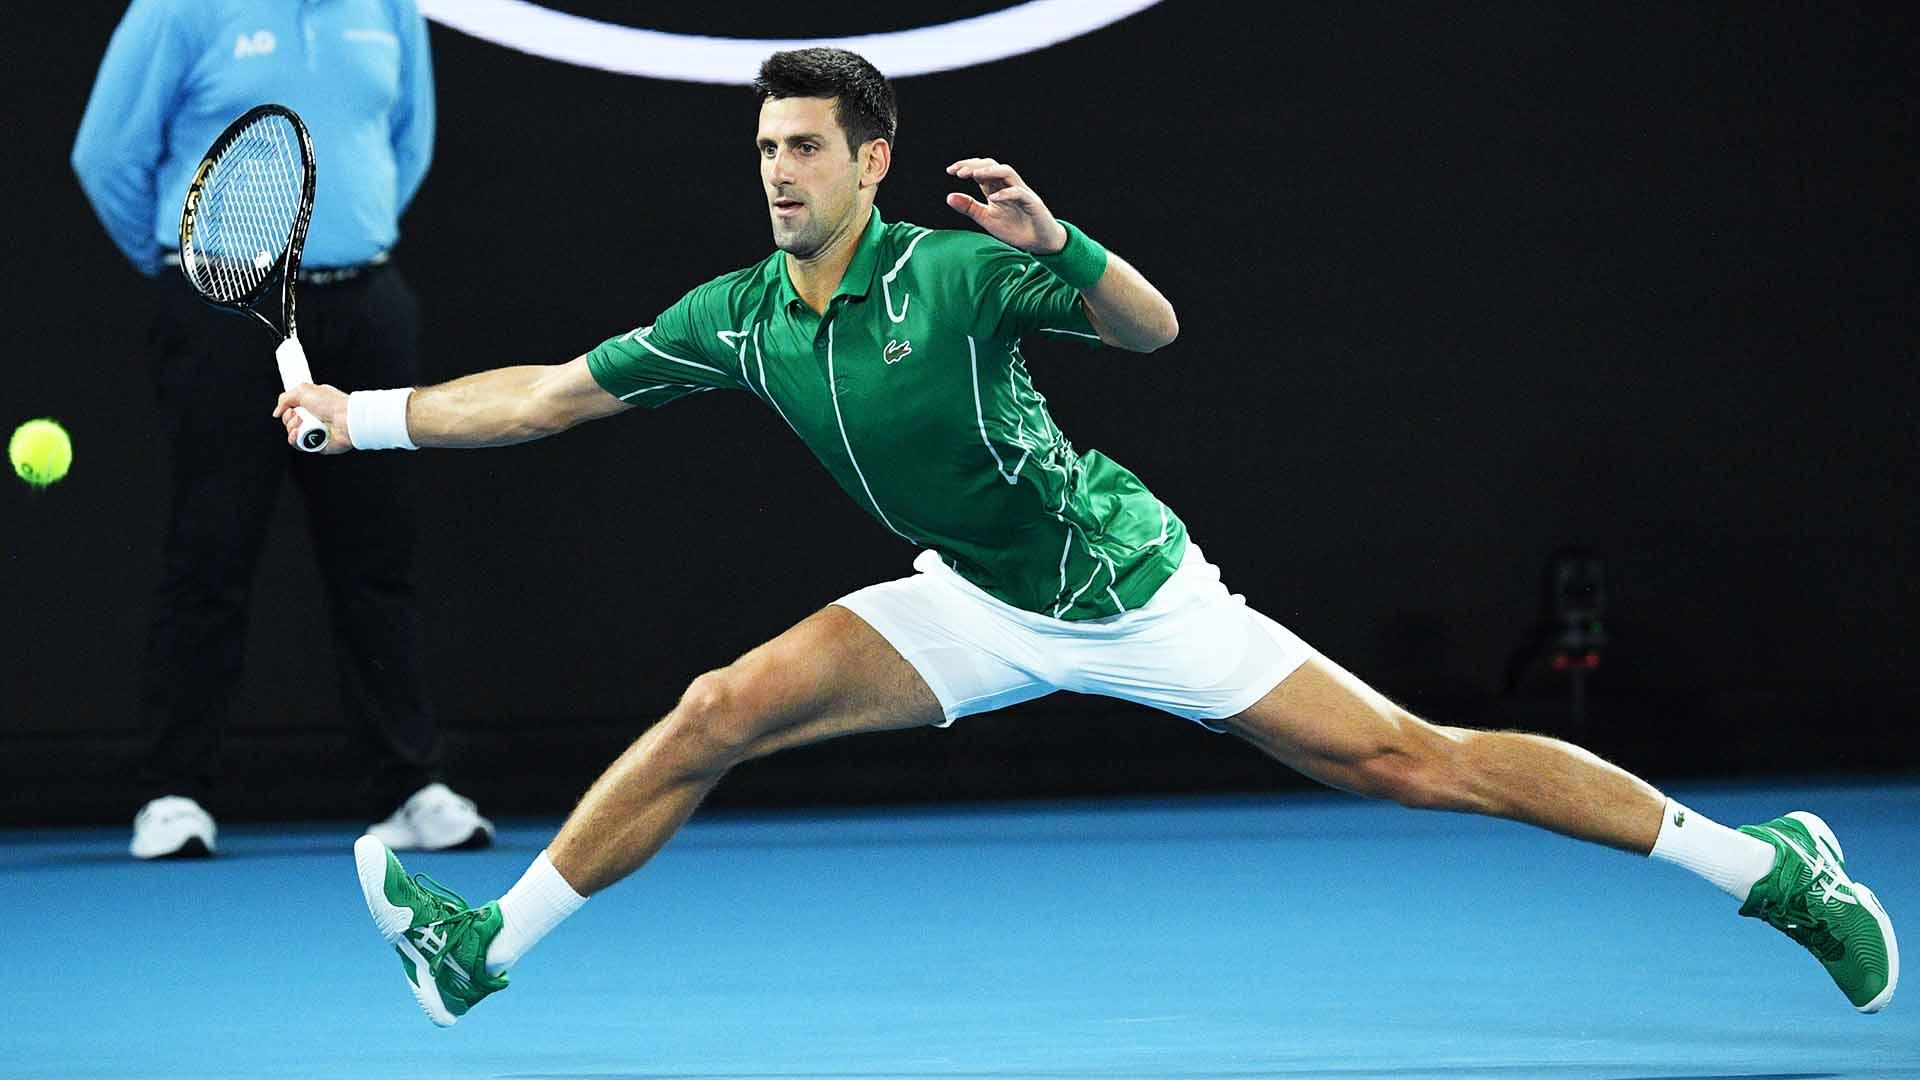 Australian Open. Ջոկովիչի մեկնարկը հաղթական էր